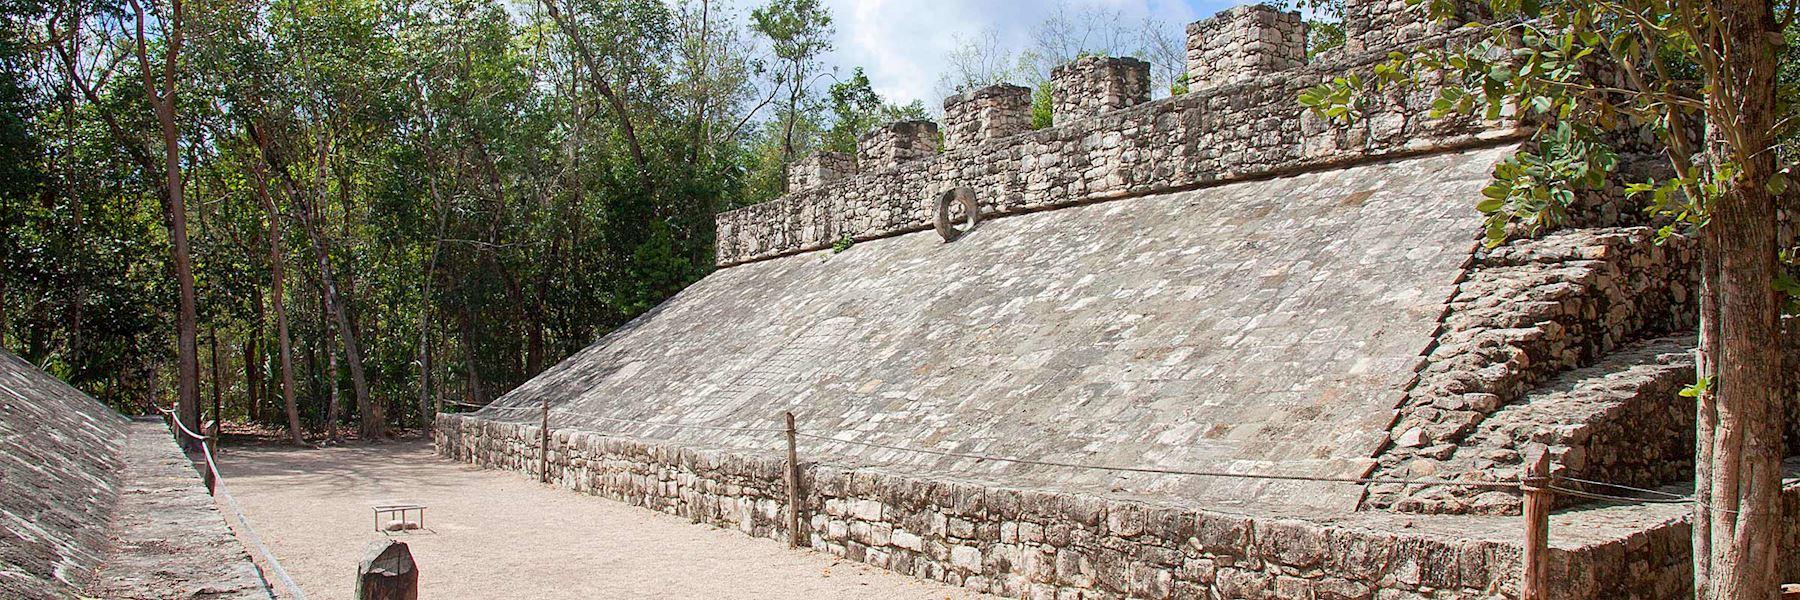 Visit Coba, Mexico